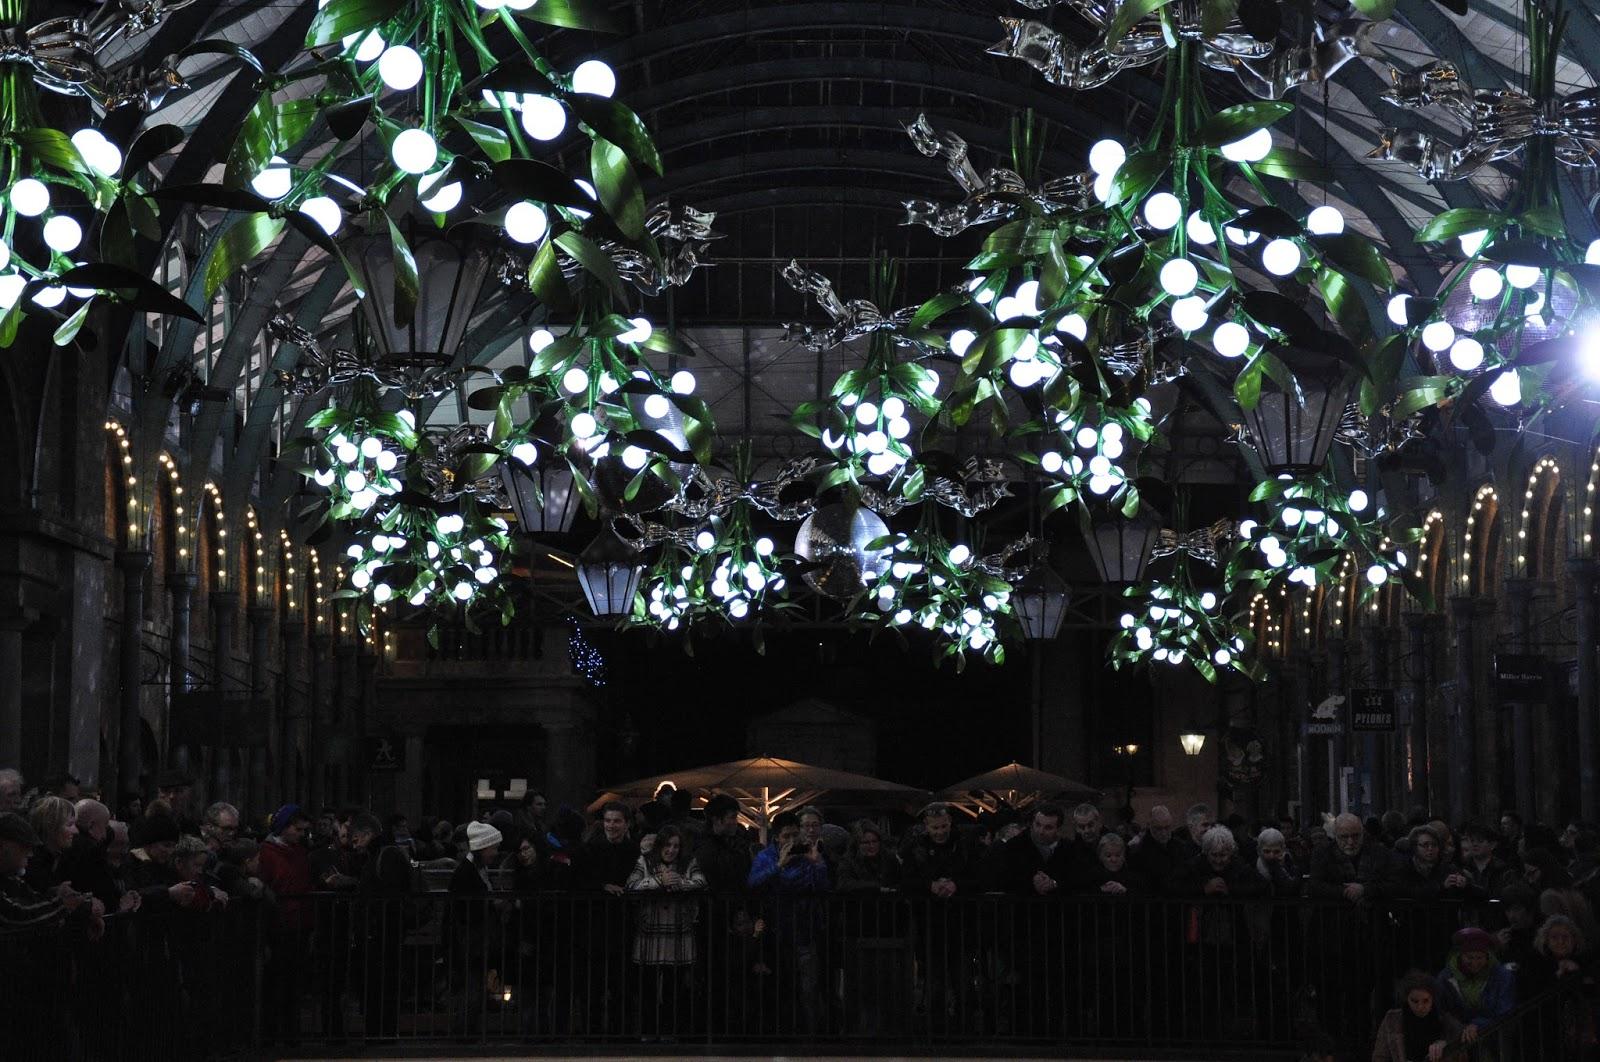 Mistletoe decorations, Covent Garden, London, England